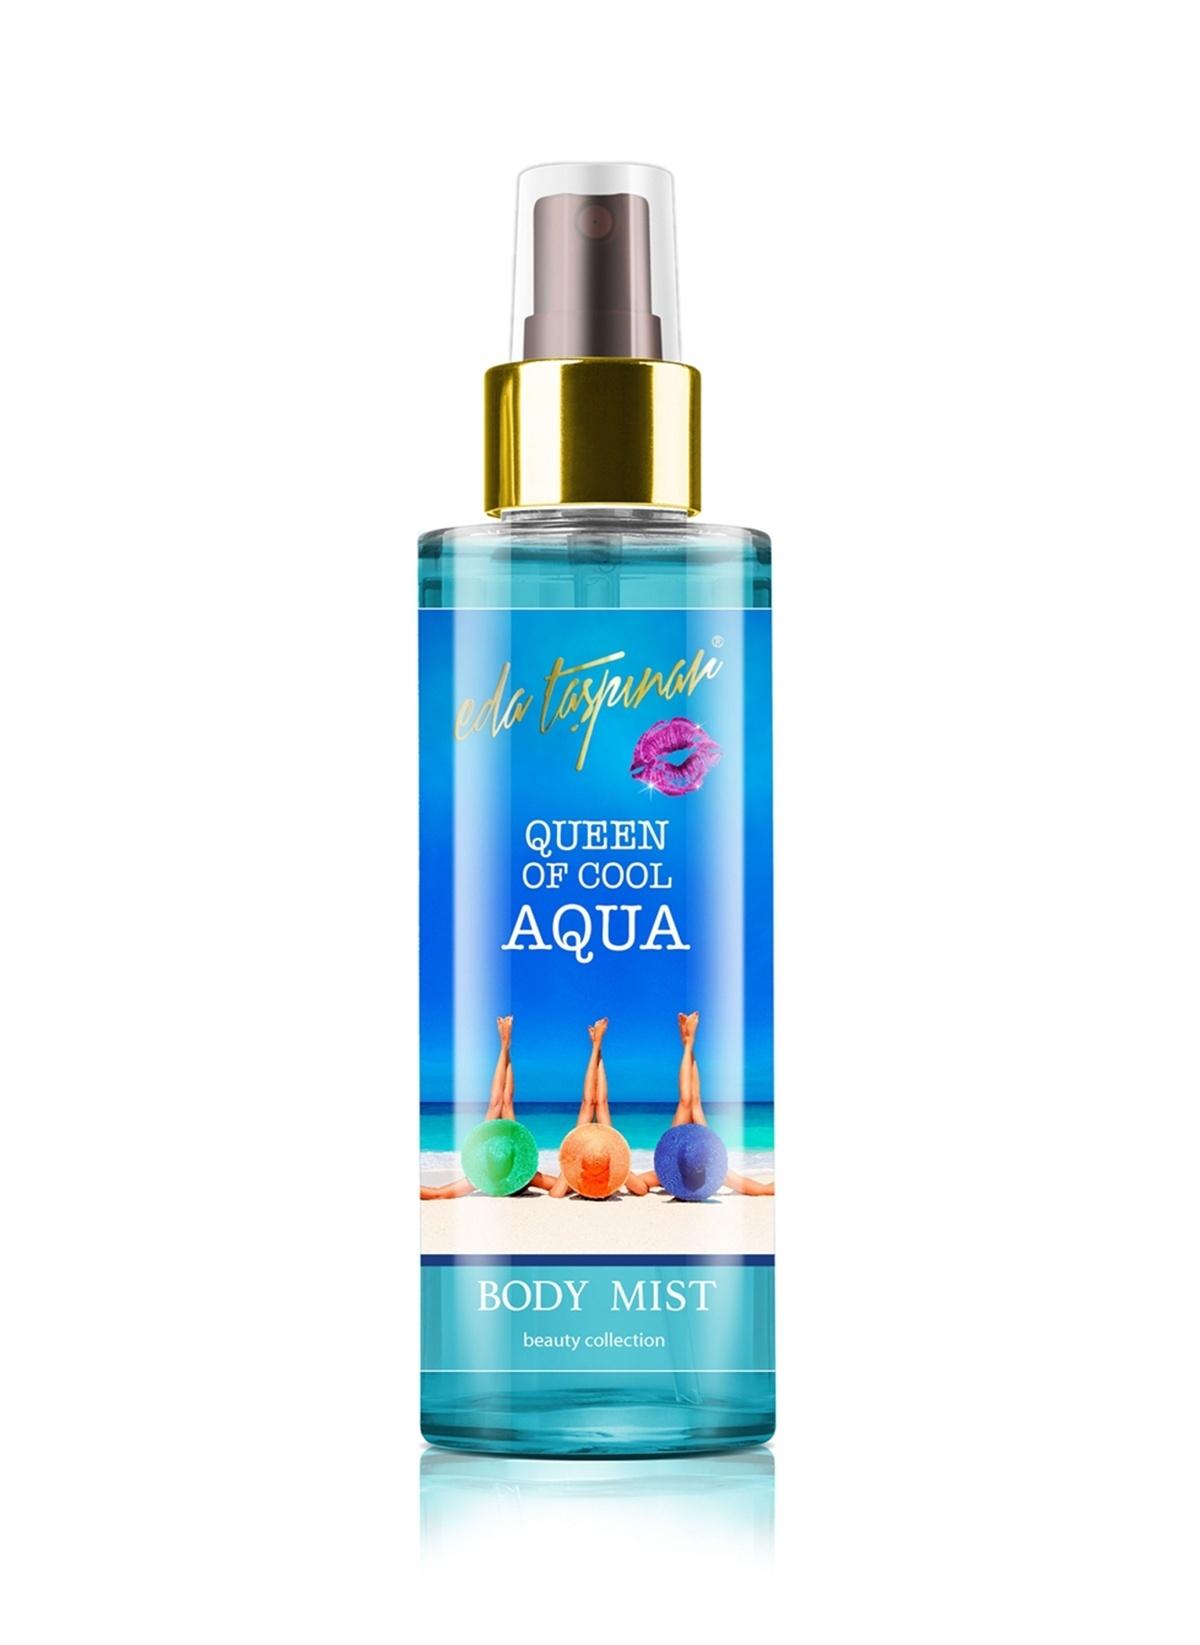 Eda Taşpınar Queen Of Cool Aqua 200 Ml Body Mist Eda Taşpınar Body Mıst Aqua – 24.99 TL